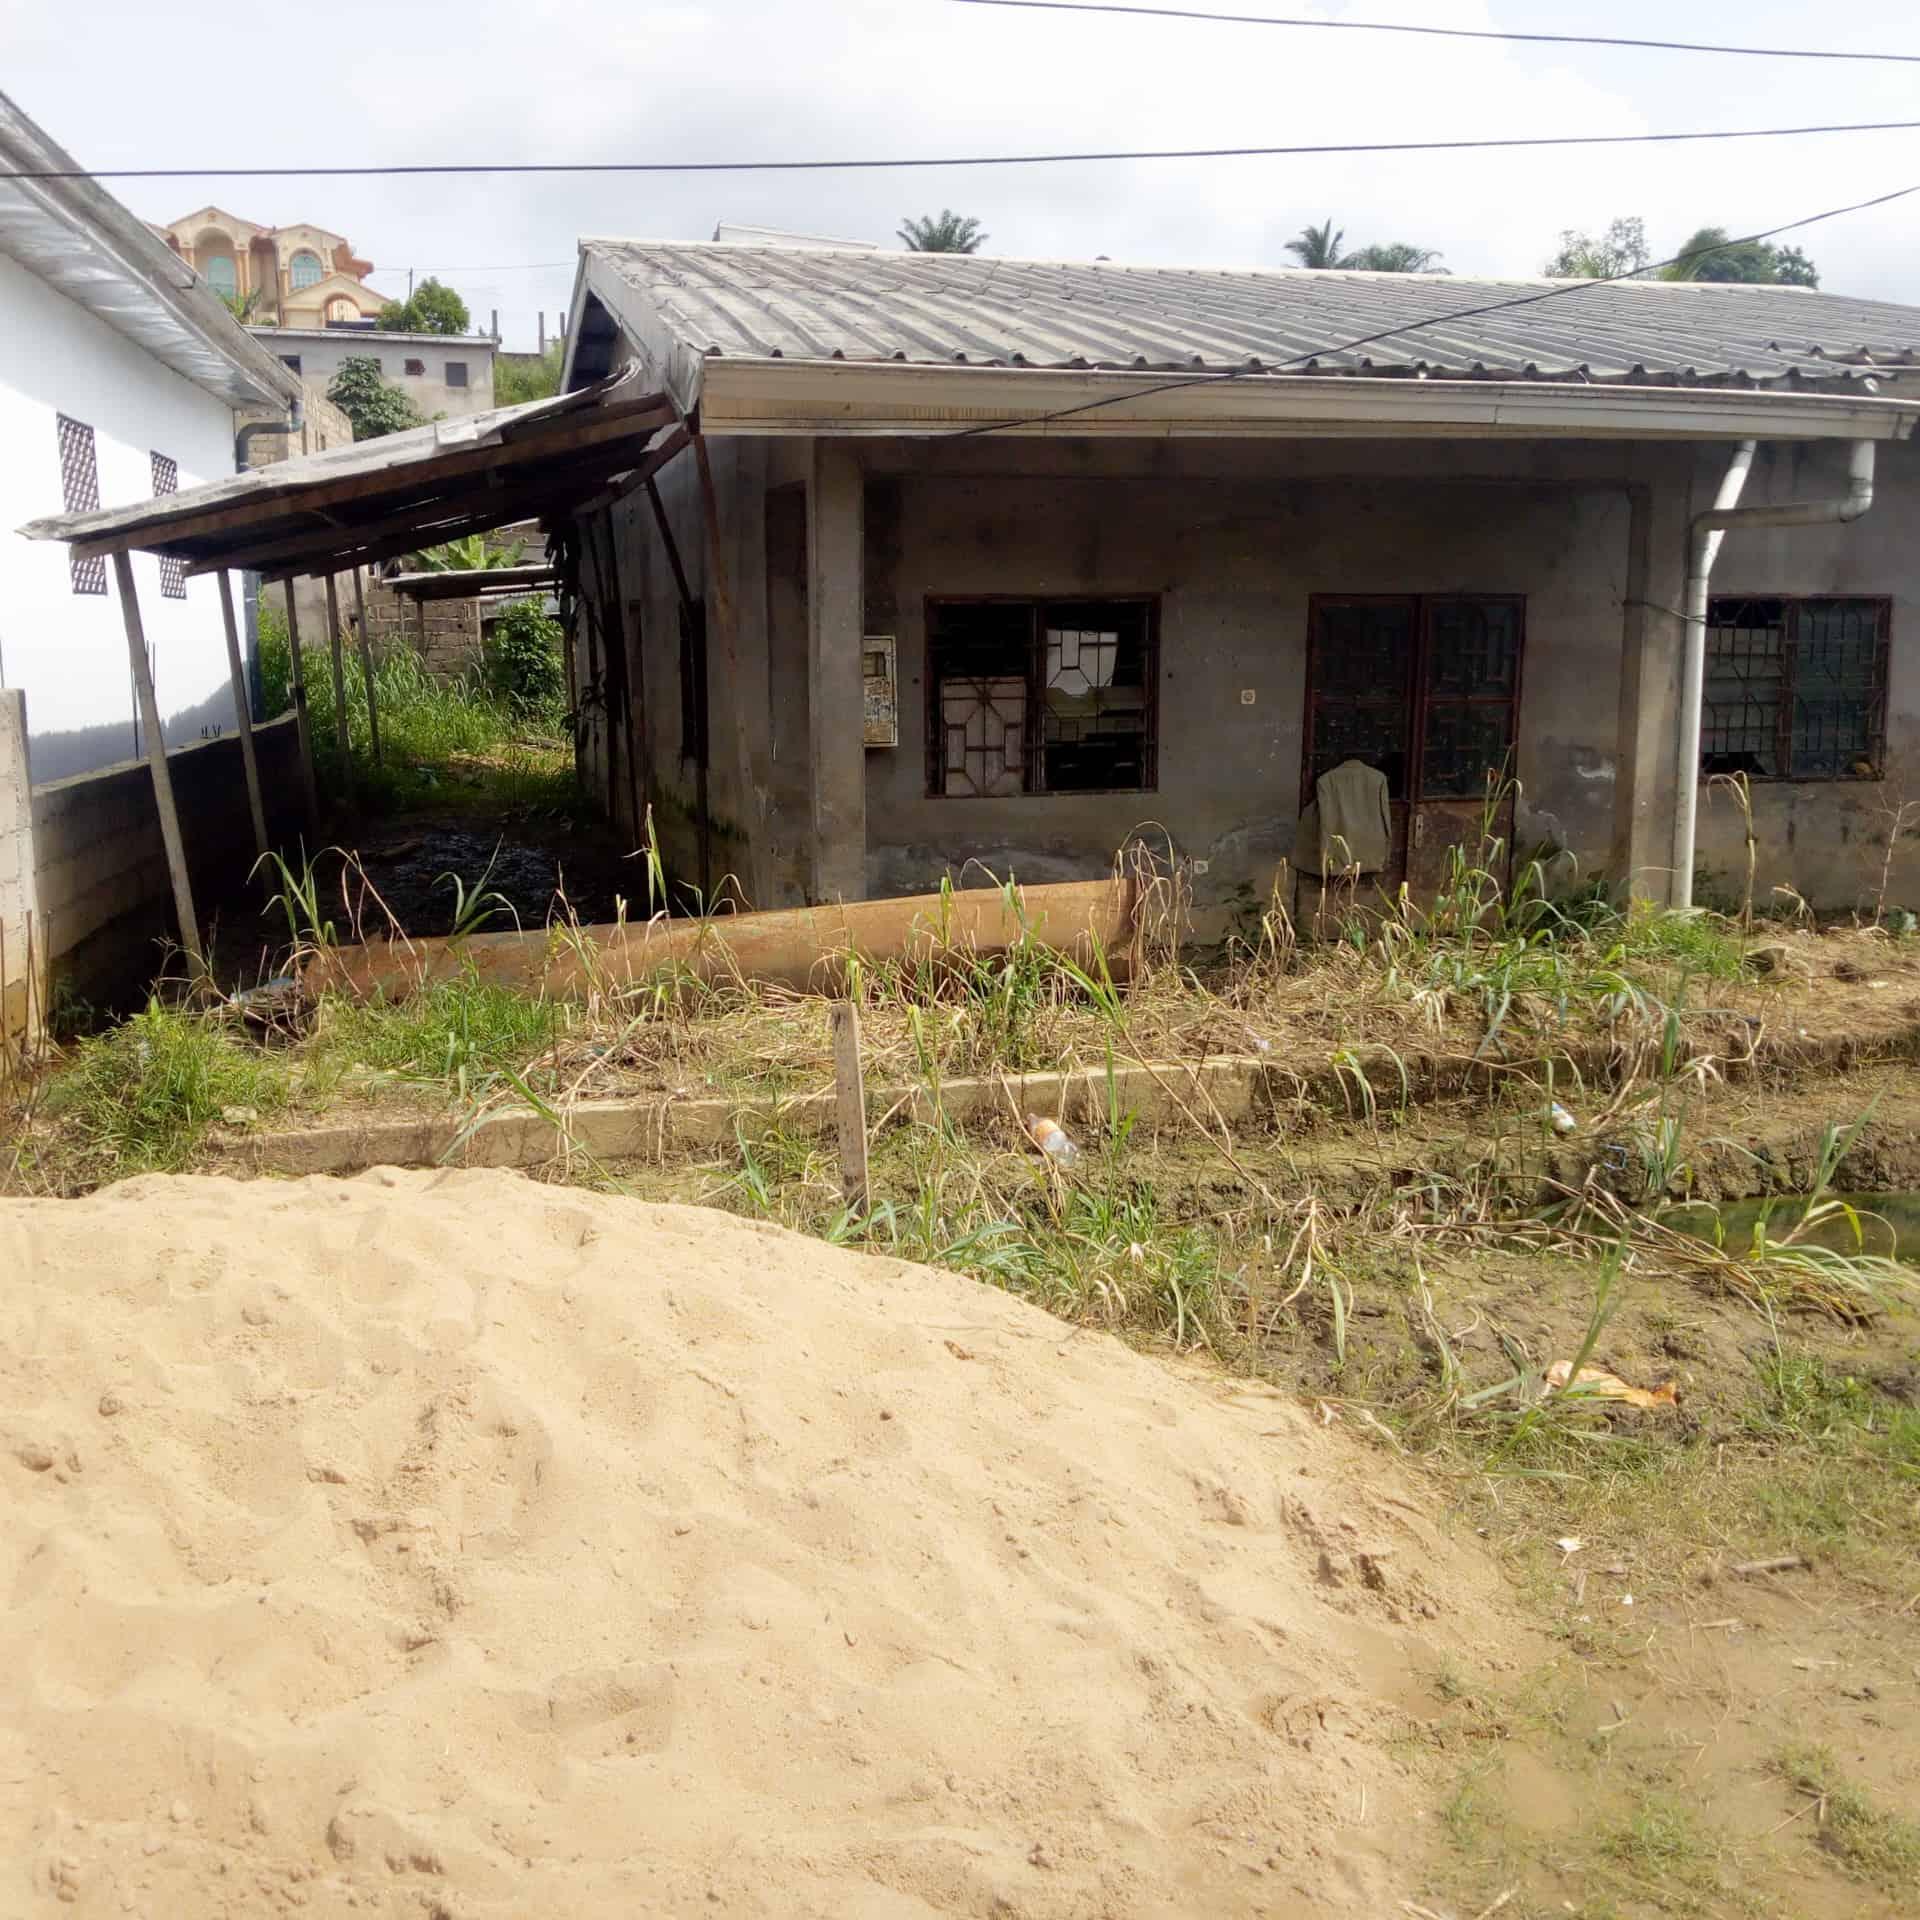 Land for sale at Douala, Bangue, Bangue toiture rouge - 480 m2 - 50 000 000 FCFA